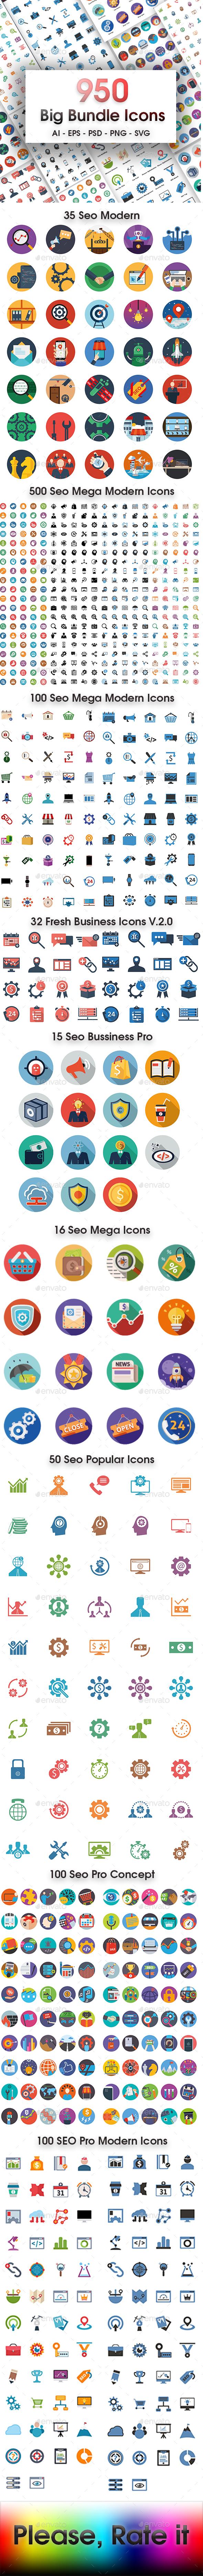 950 Big Bundle Icons - Icons